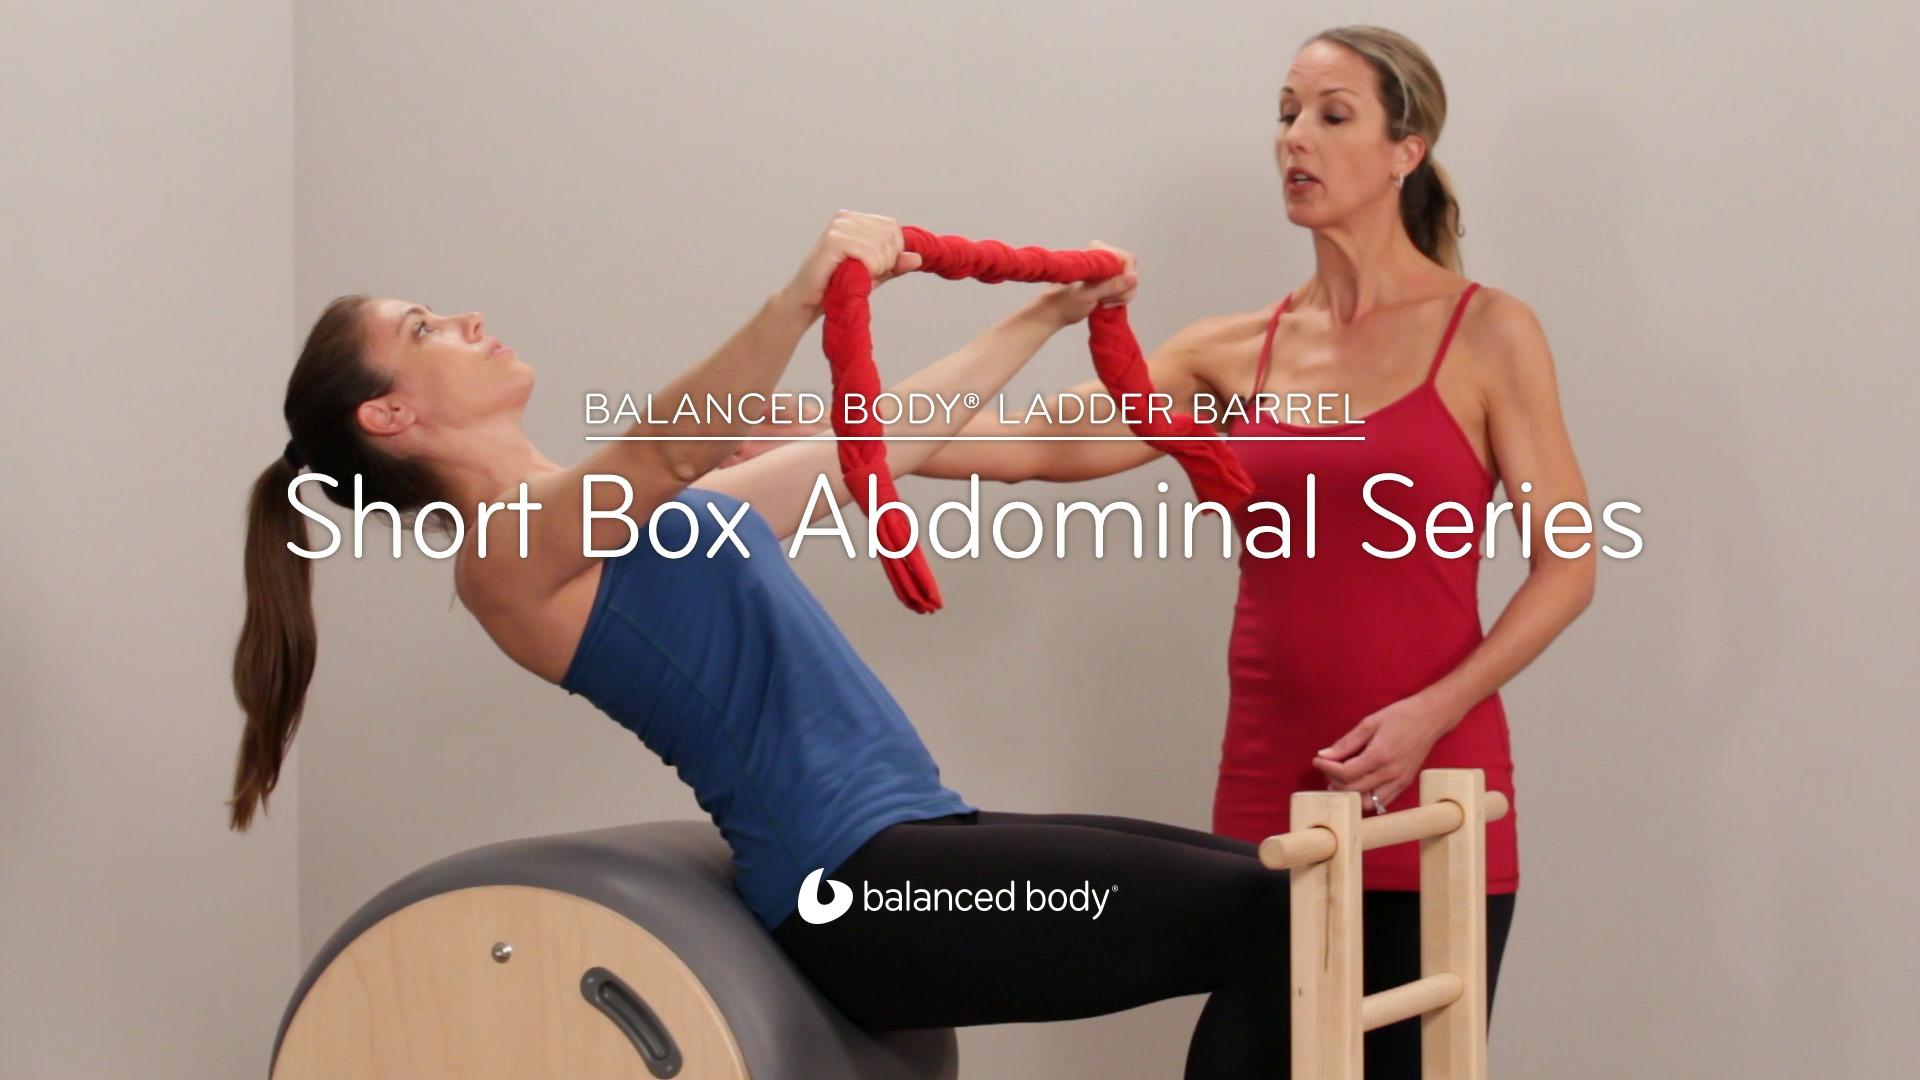 Artwork for Balanced Body® Ladder Barrel: Short Box Abdominal Series